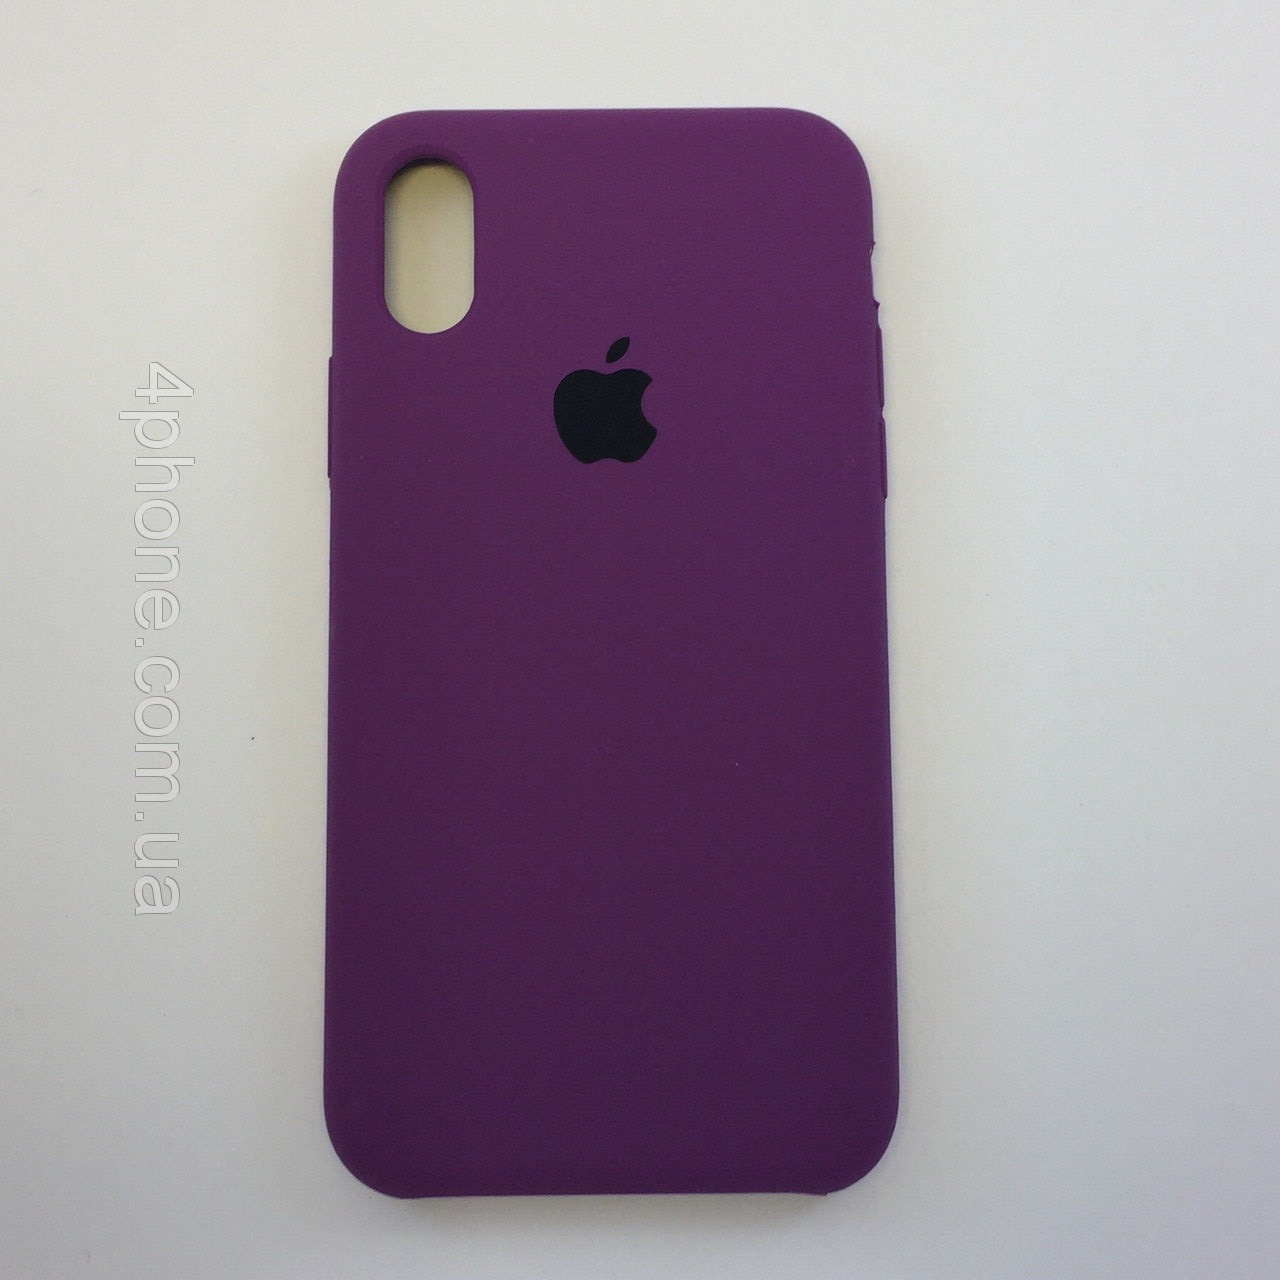 "Чехол - Silicon Case для iPhone ""Пурпурный- №45"" - copy orig., фото 1"